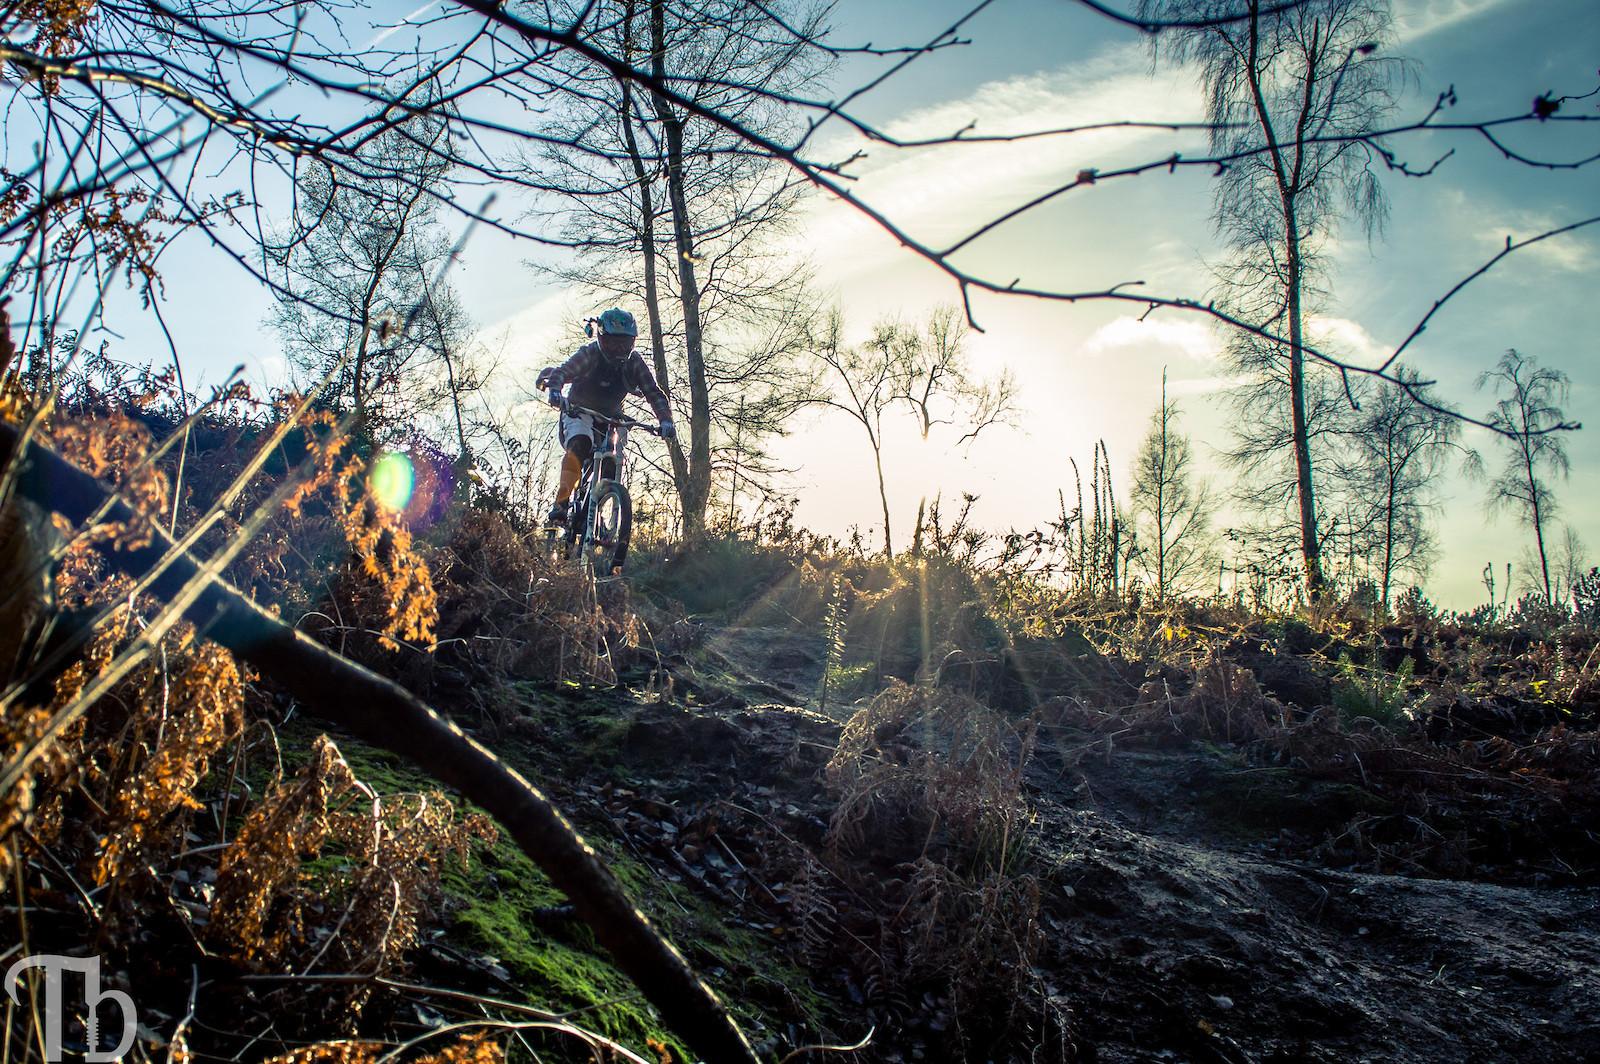 Sunflare Kalula - KillerXL5 - Mountain Biking Pictures - Vital MTB